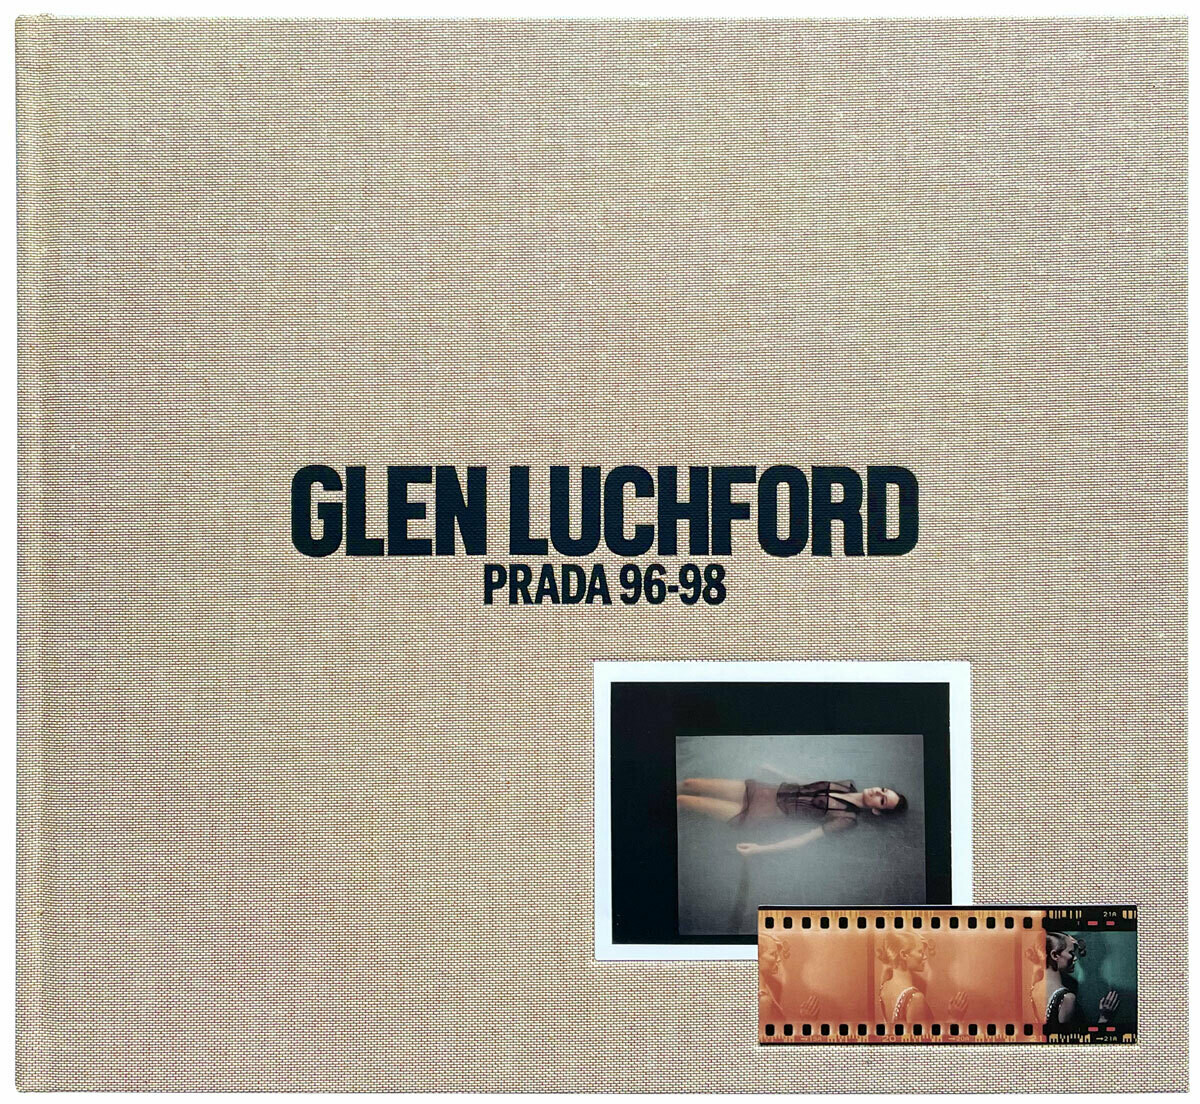 Glen Luchford Prada 96-98